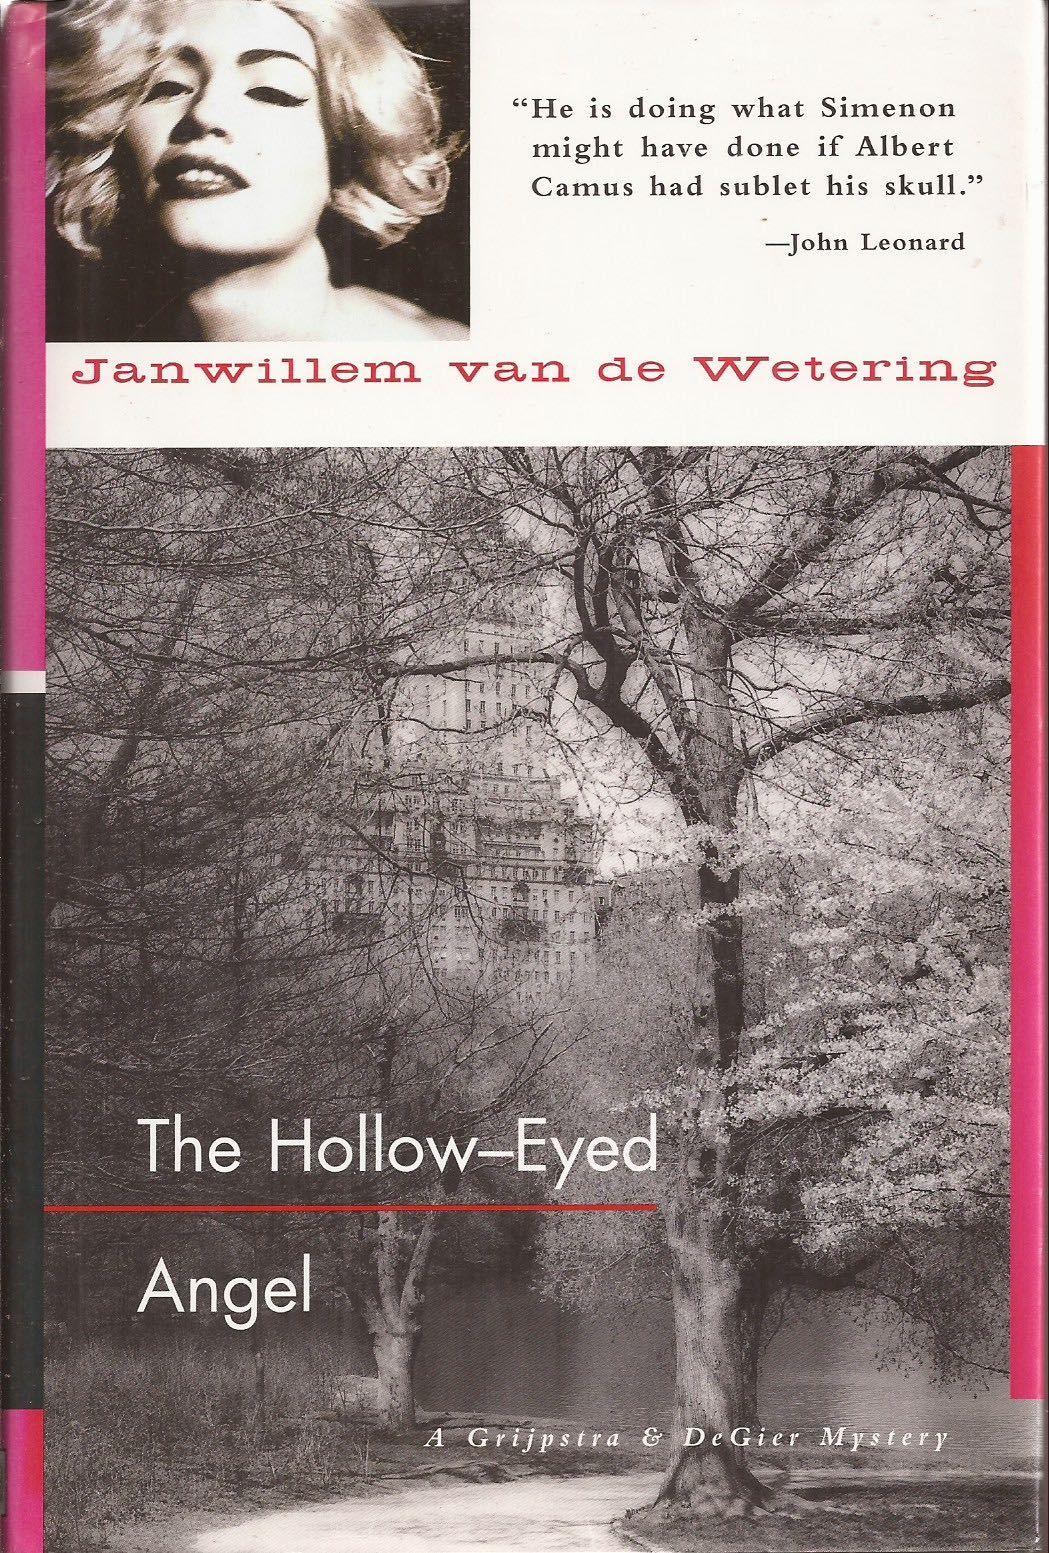 9781569470565 The Hollow Eyed Angel By Janwillem Van De